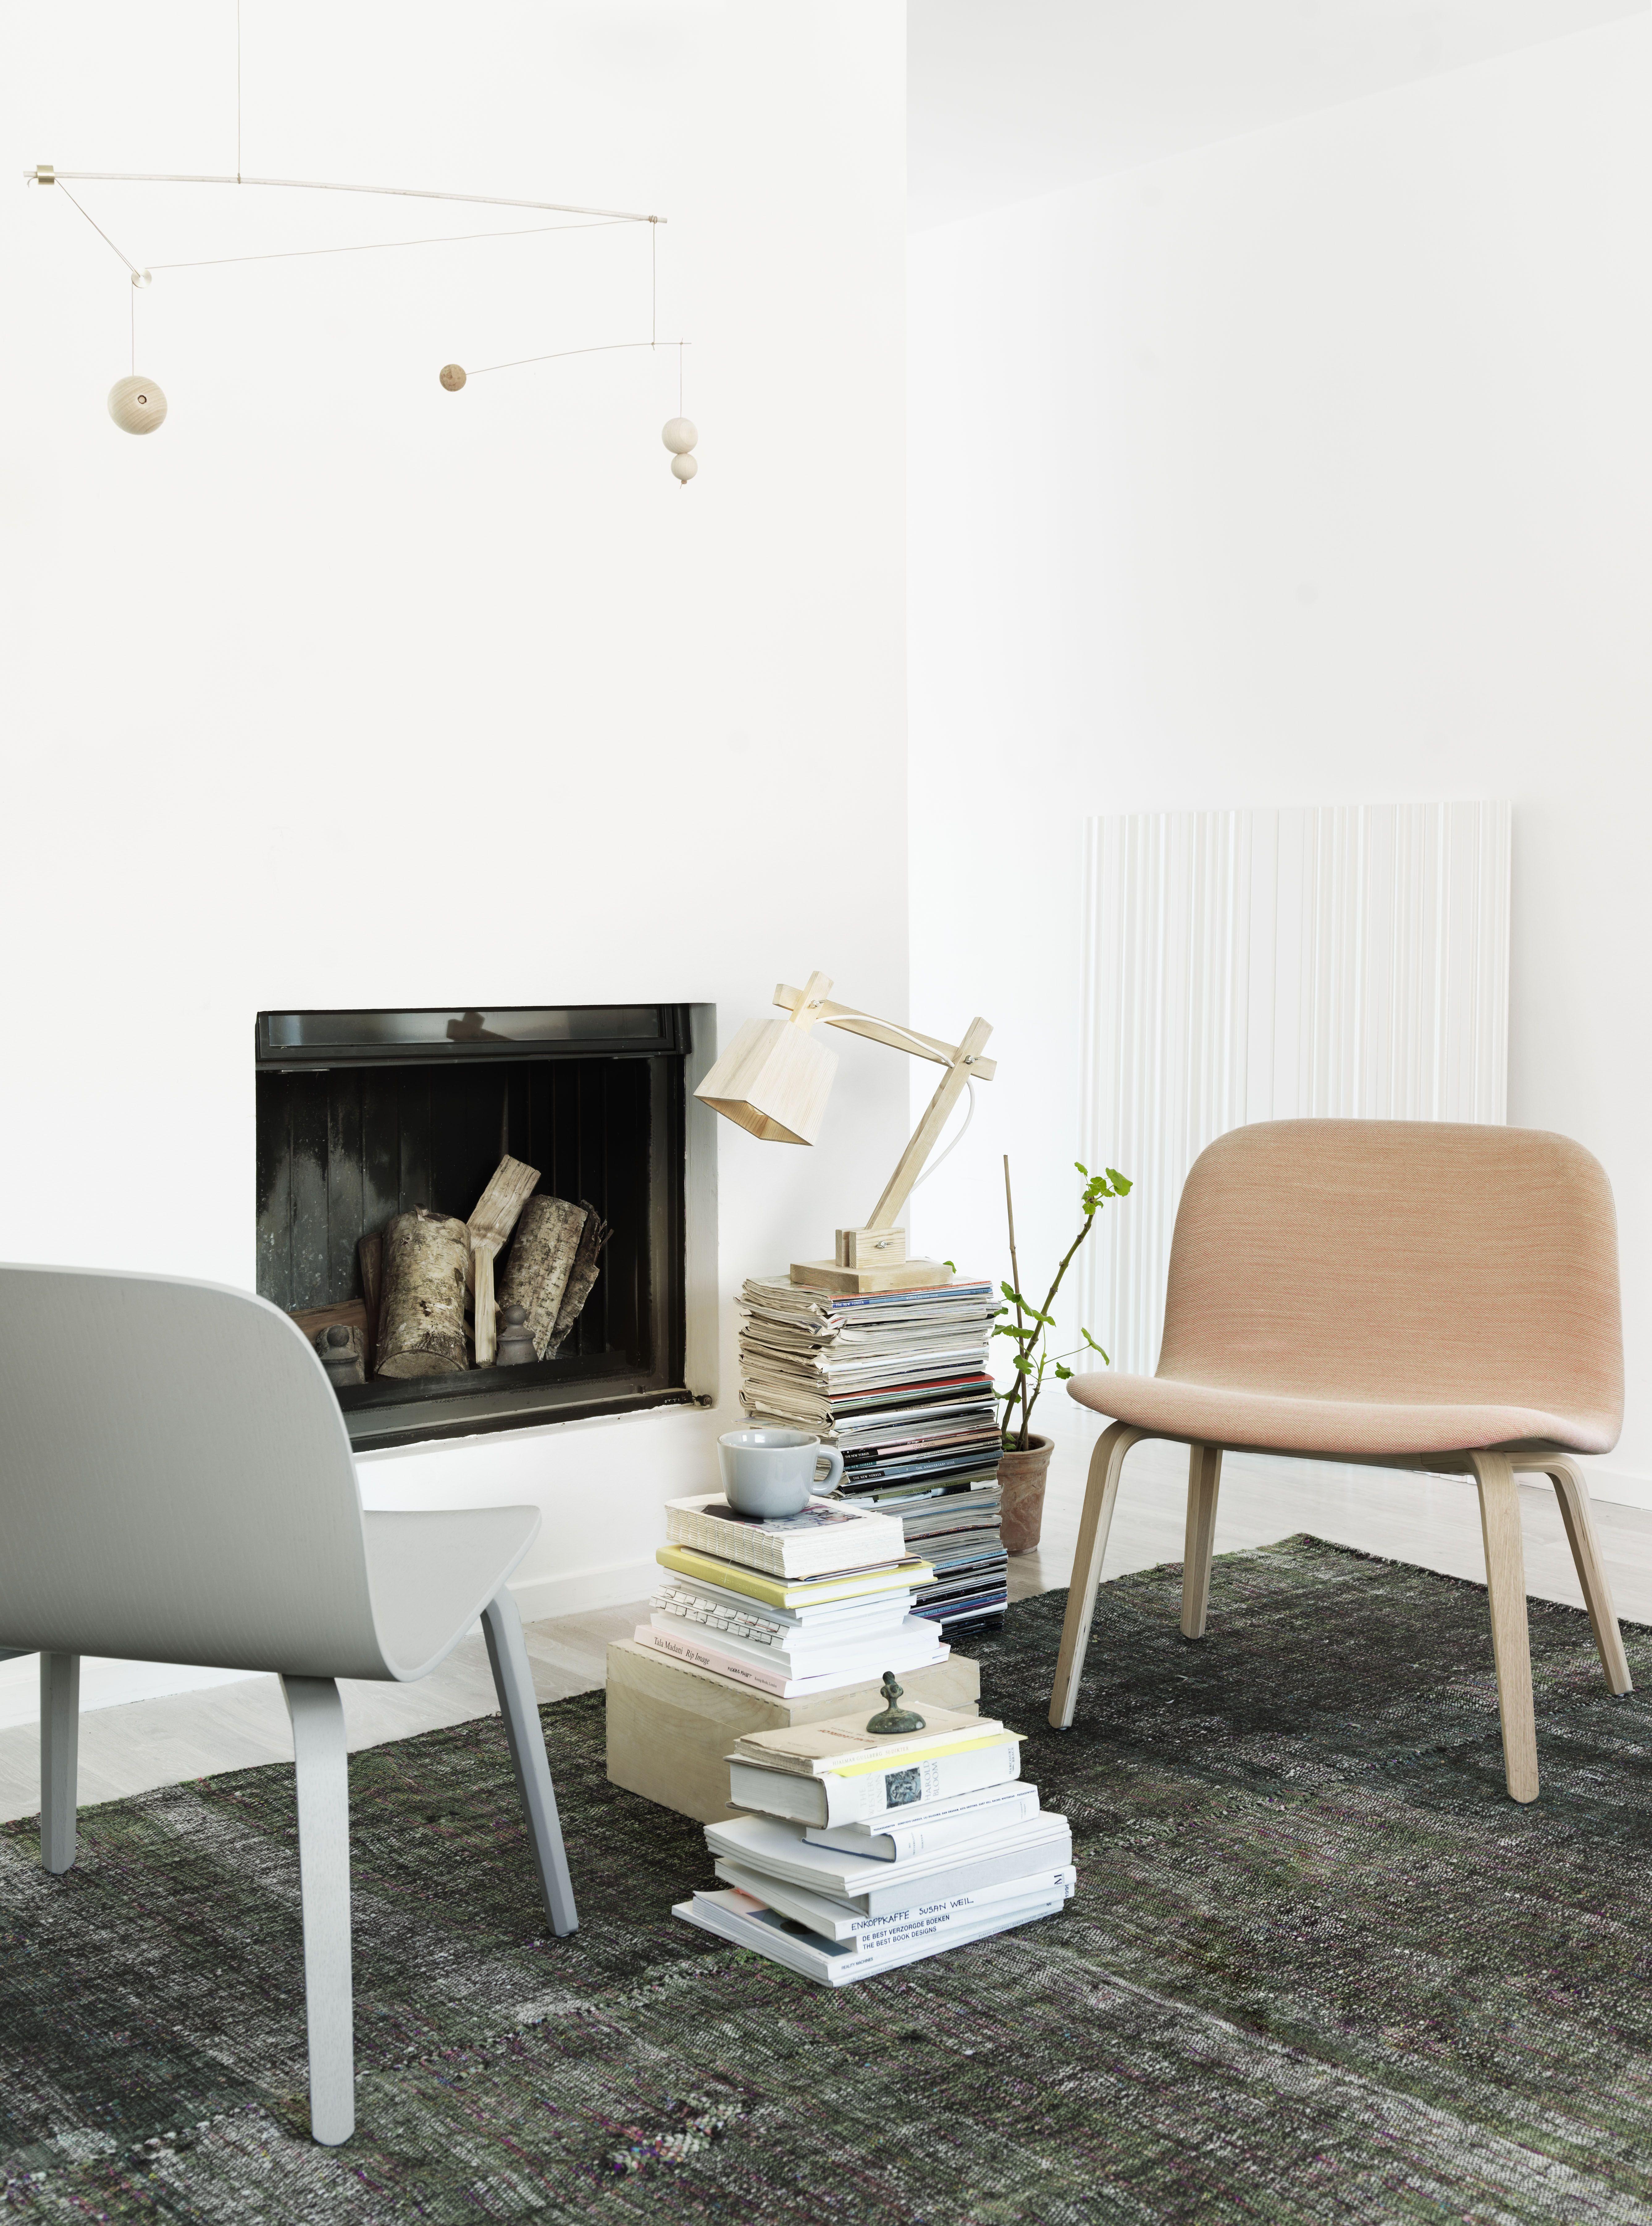 Visu Lounge Focus Jpg 5350 7208 Lounge Stuhl Mobeldesign Wohnzimmer Inspiration